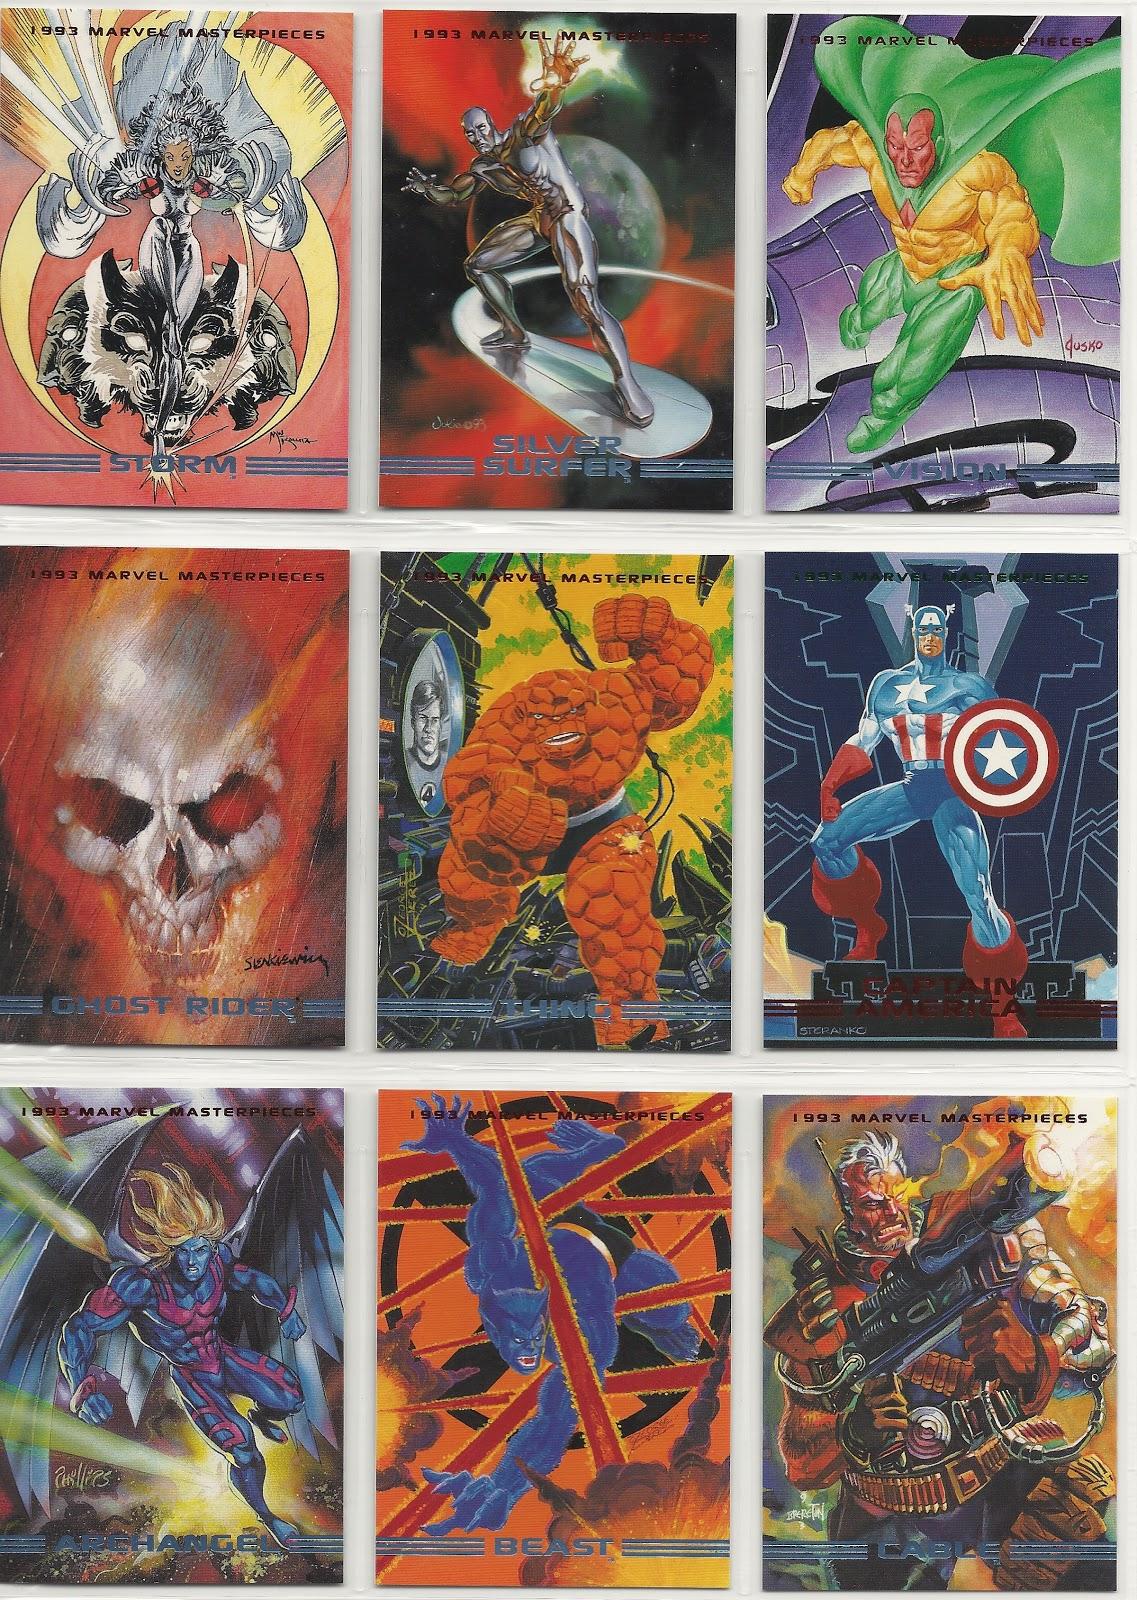 Morbius Marvel >> 1993 MARVEL MASTERPIECES: Base Set (#1-90)